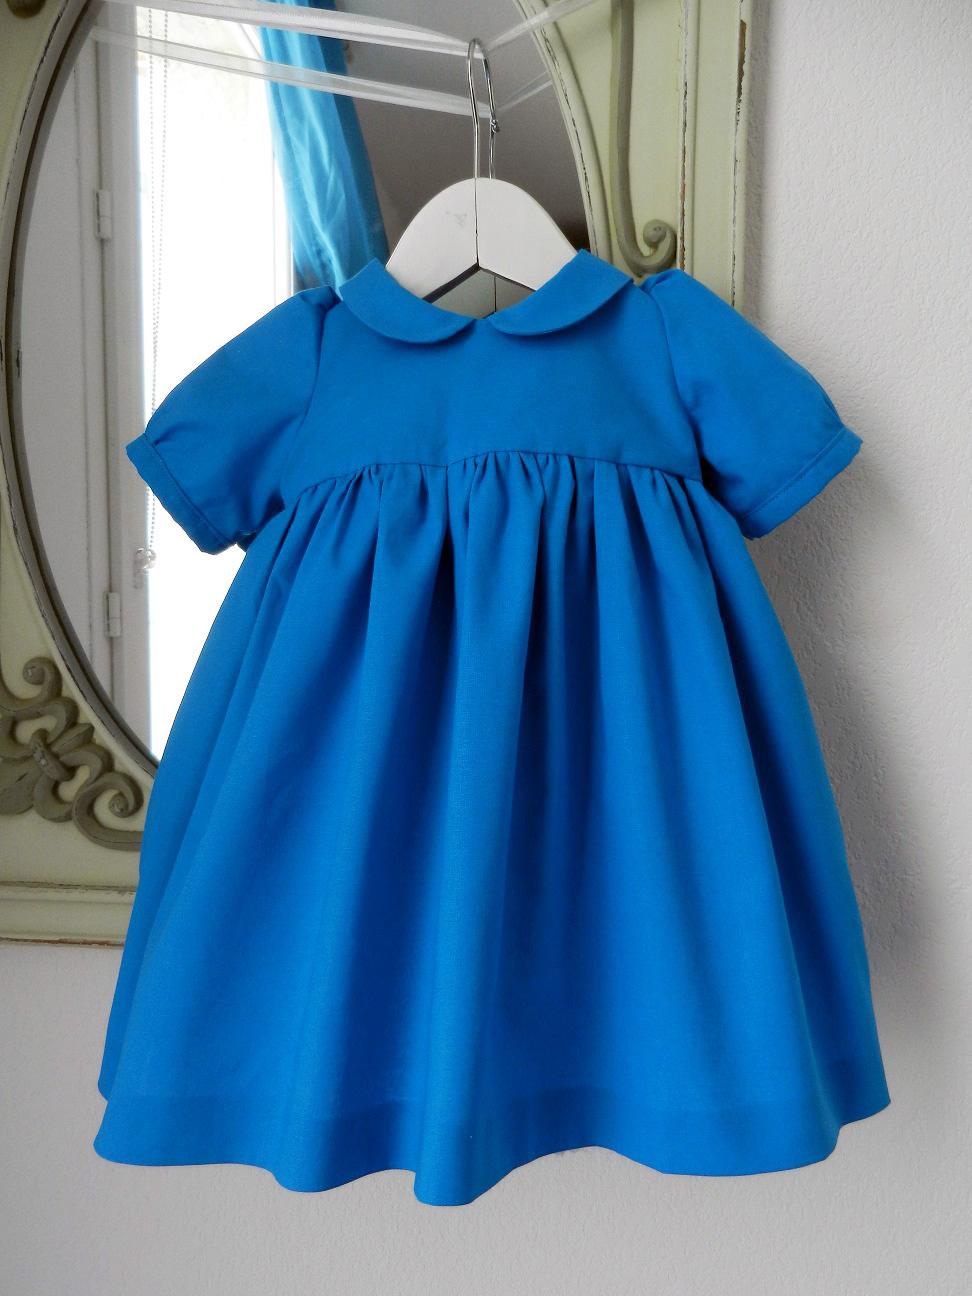 Duchesse or ange 190 robe bleue alice tablier blanc jupon blue dress white apron petticoat a